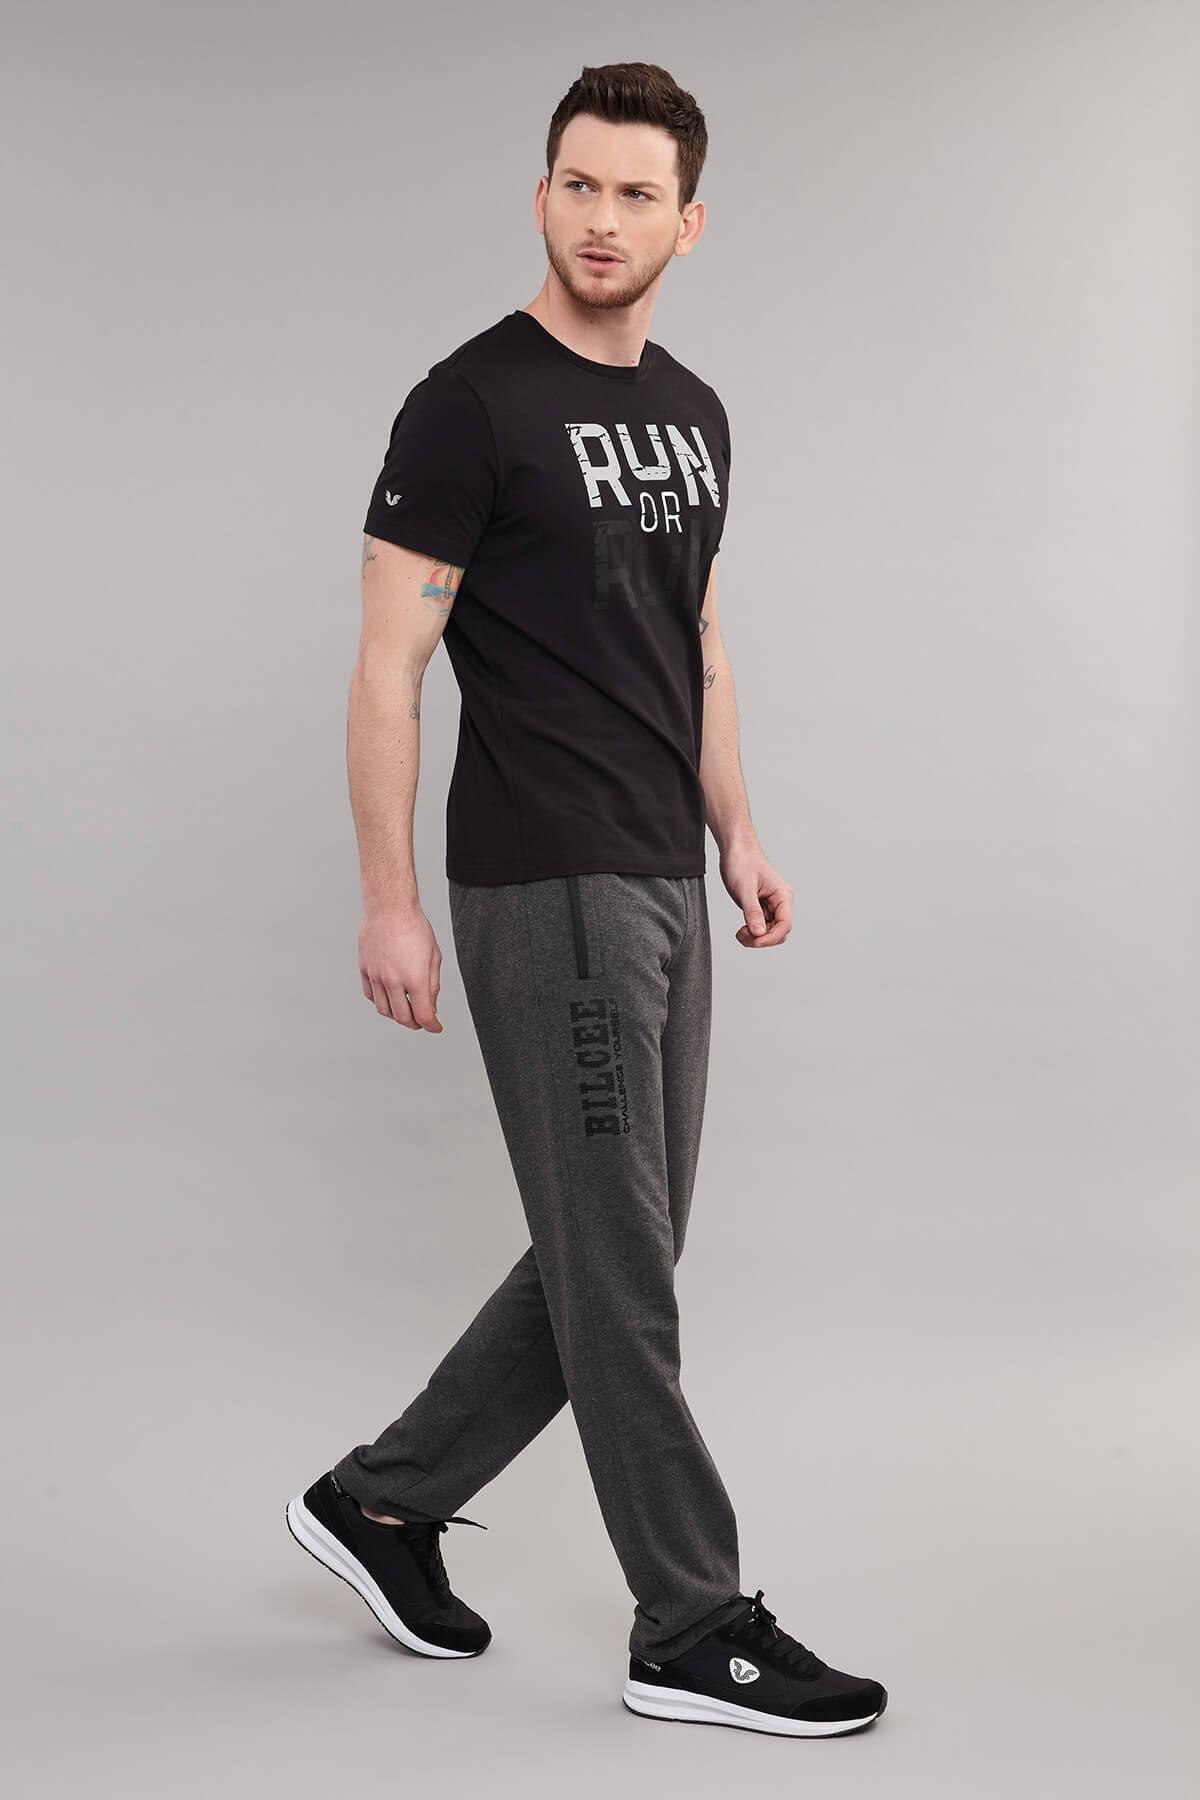 bilcee Siyah Pamuklu Erkek T-Shirt ES-1362 2